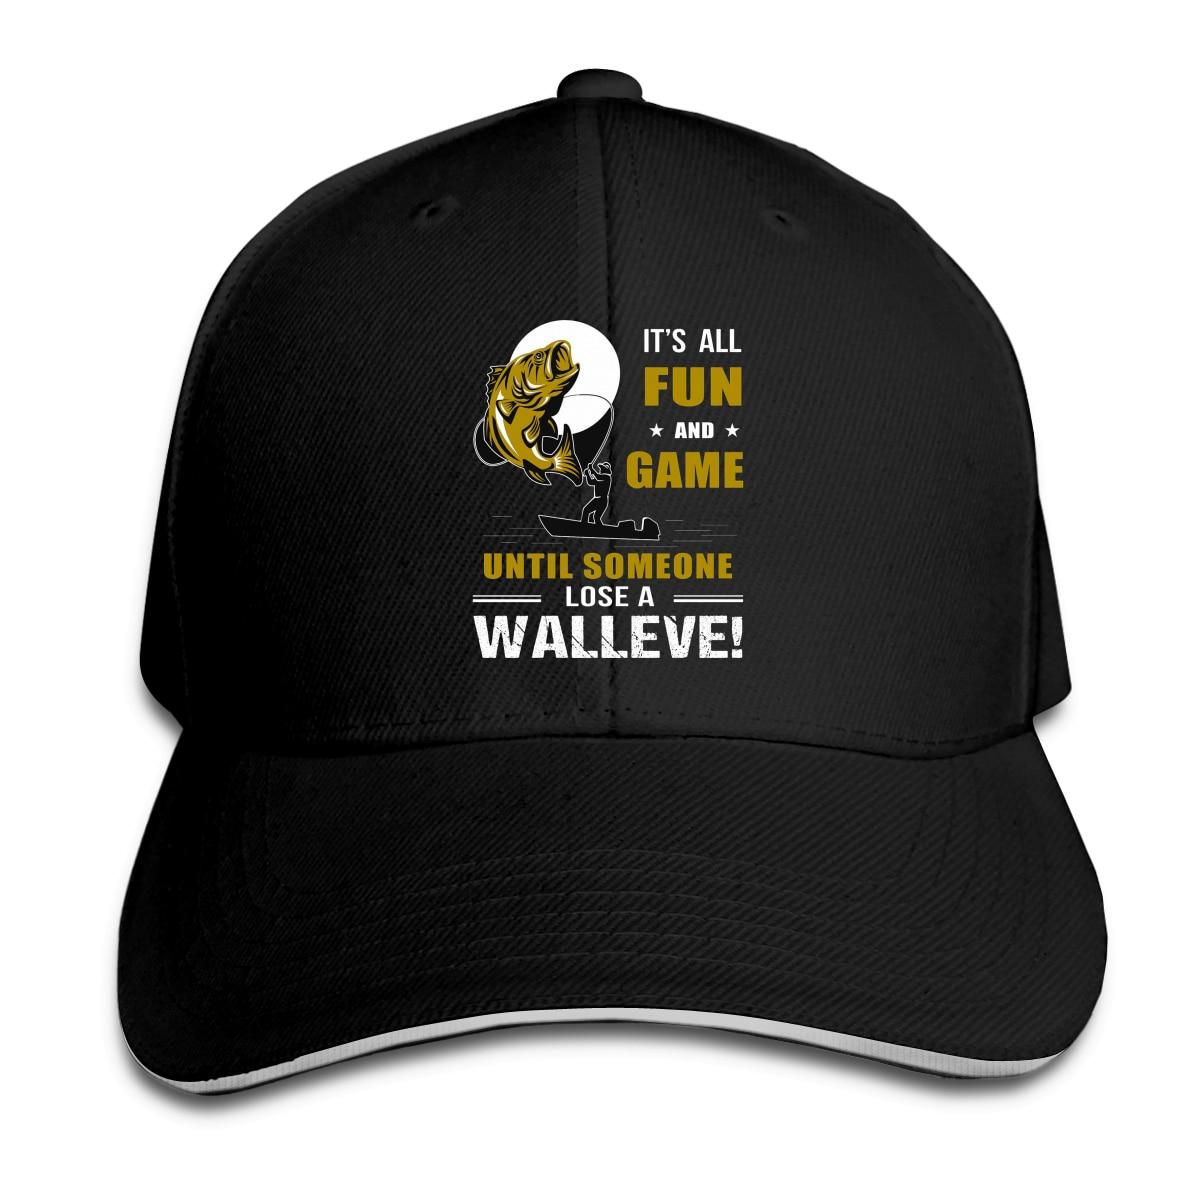 Funny Walleye Fishing Mug - Walleye Fishing Baseball Cap Peaked Cap Cotton Cap Snapback Hat Summer Cap Hip Hop Cap fishing